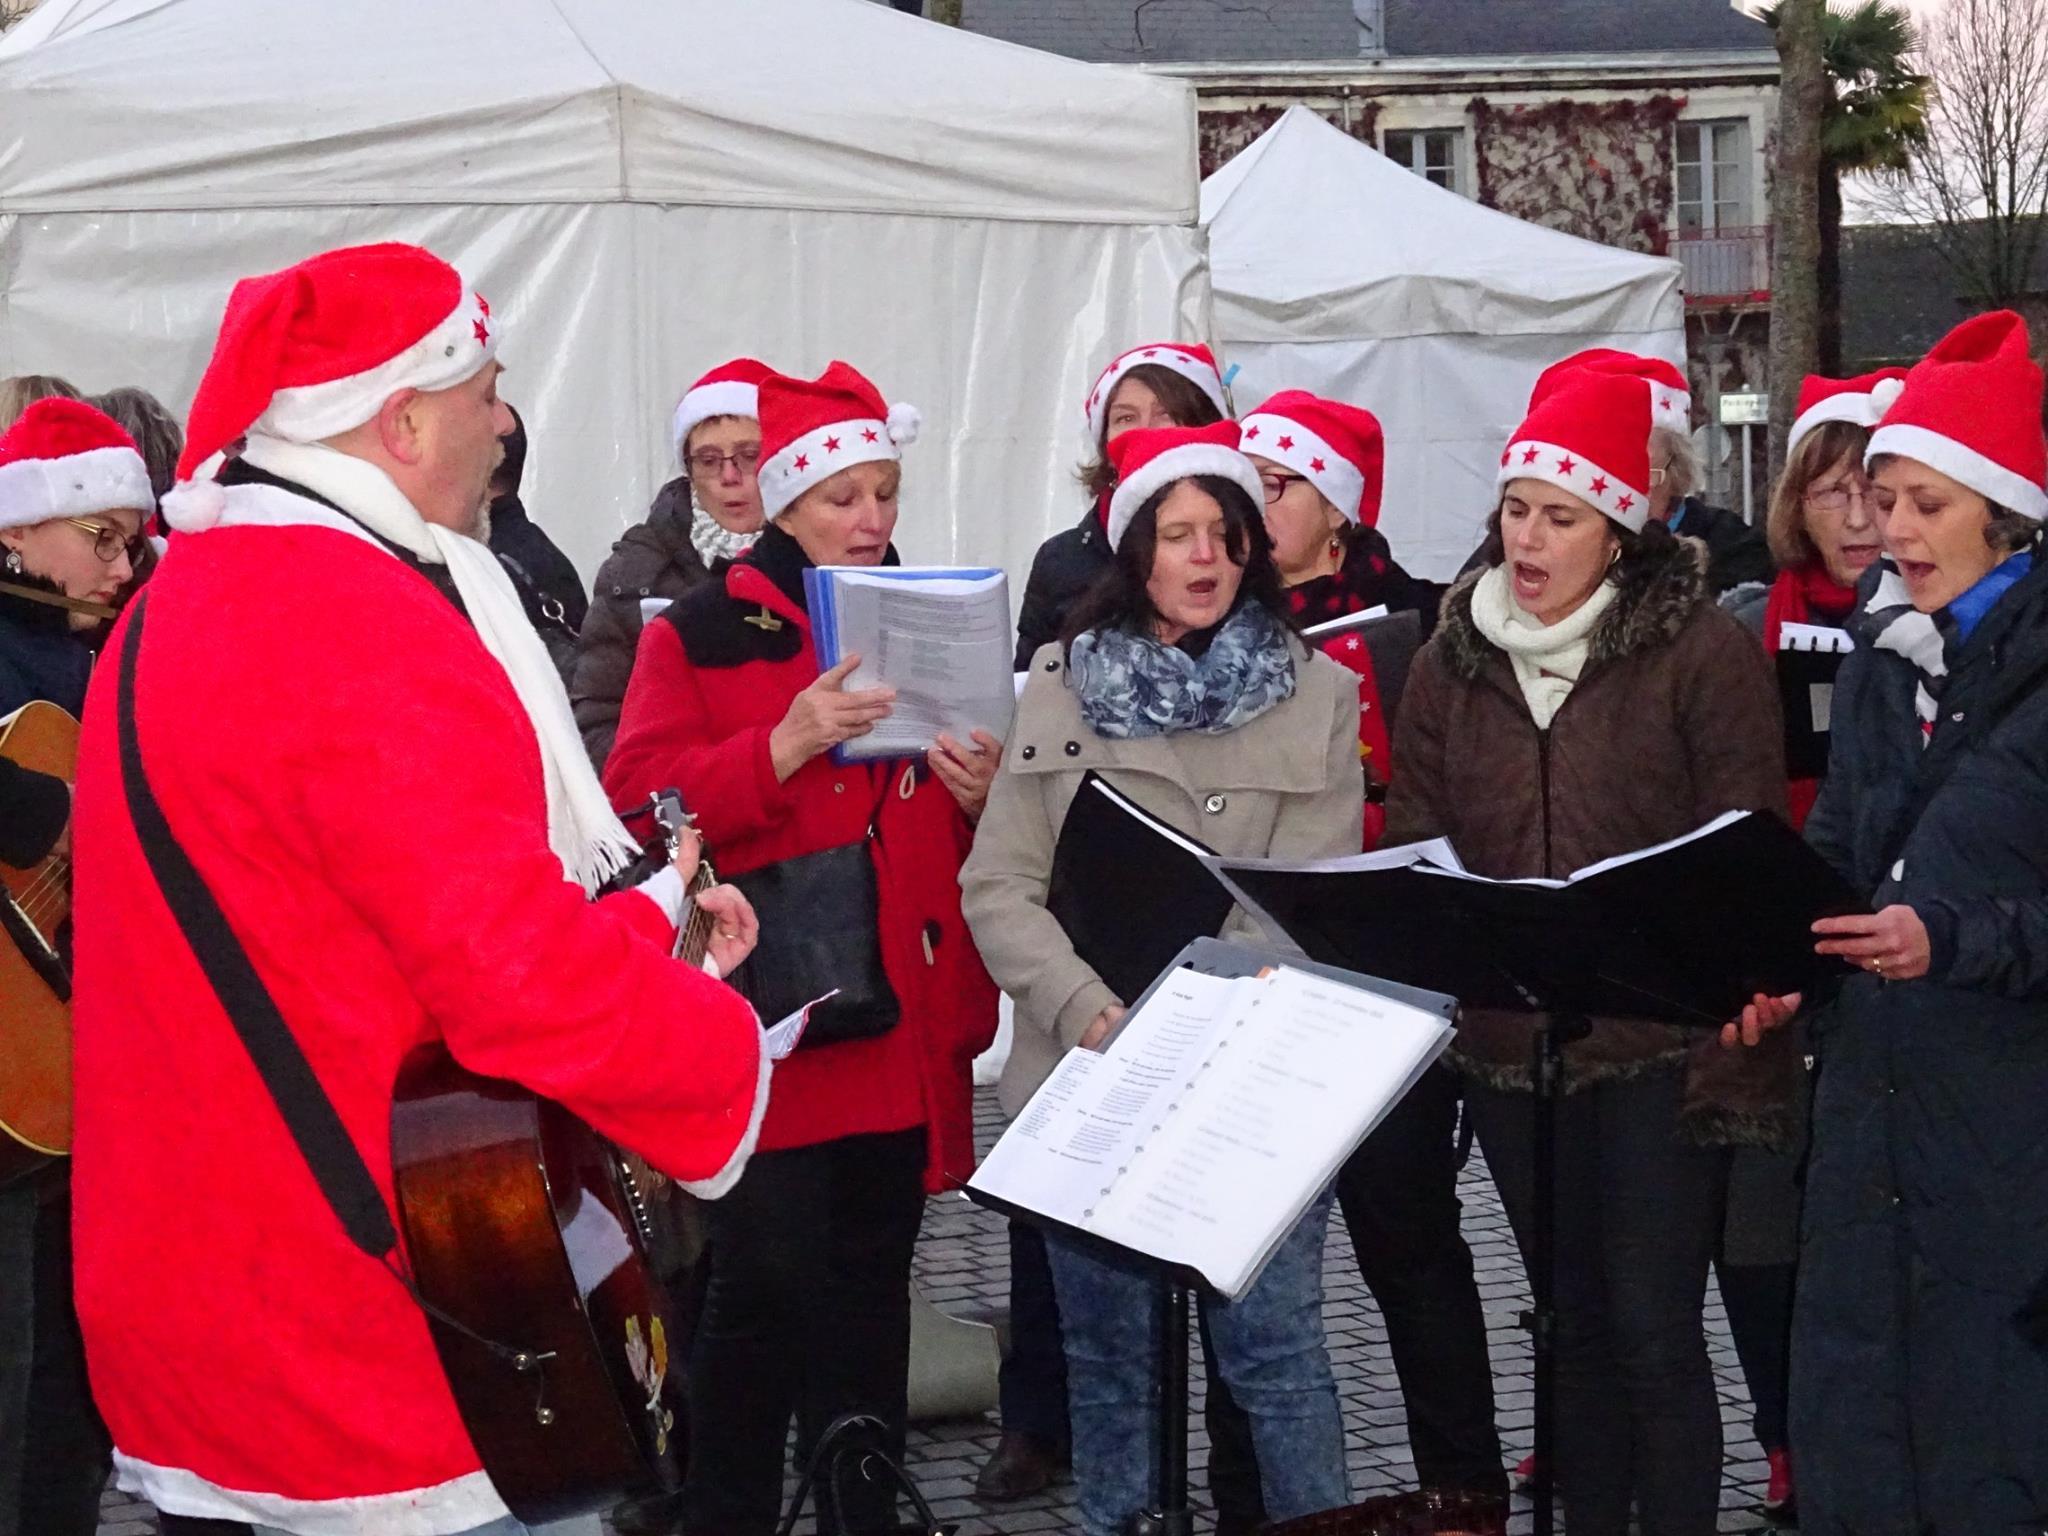 2015-12-12 – Au marché de Noël (13) Sabrina